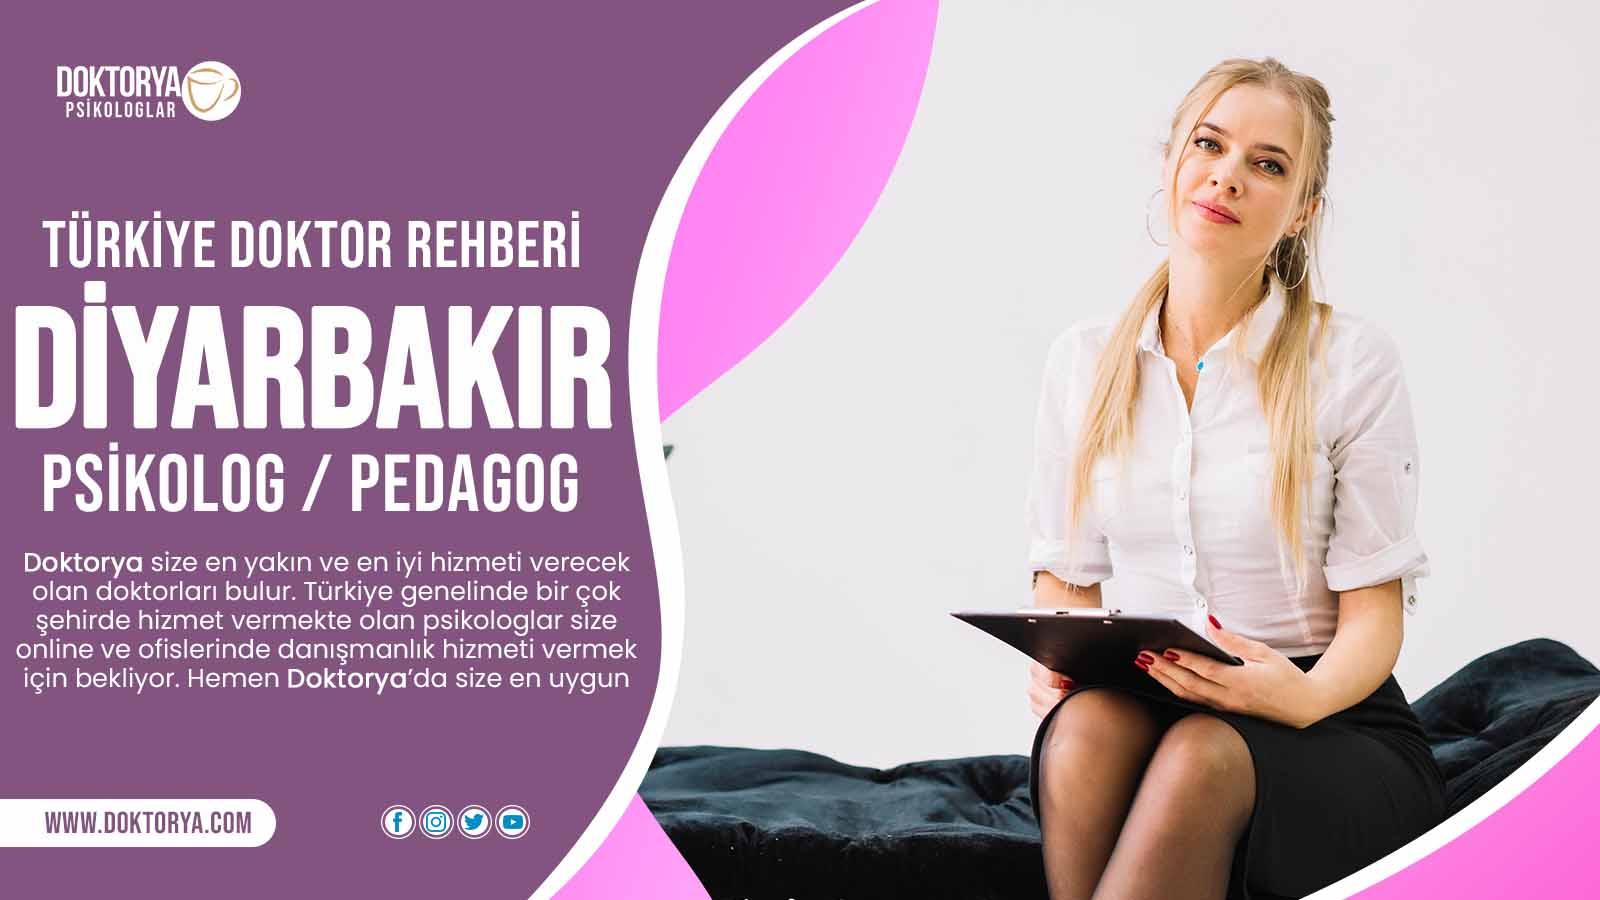 Diyarbakır Psikolog